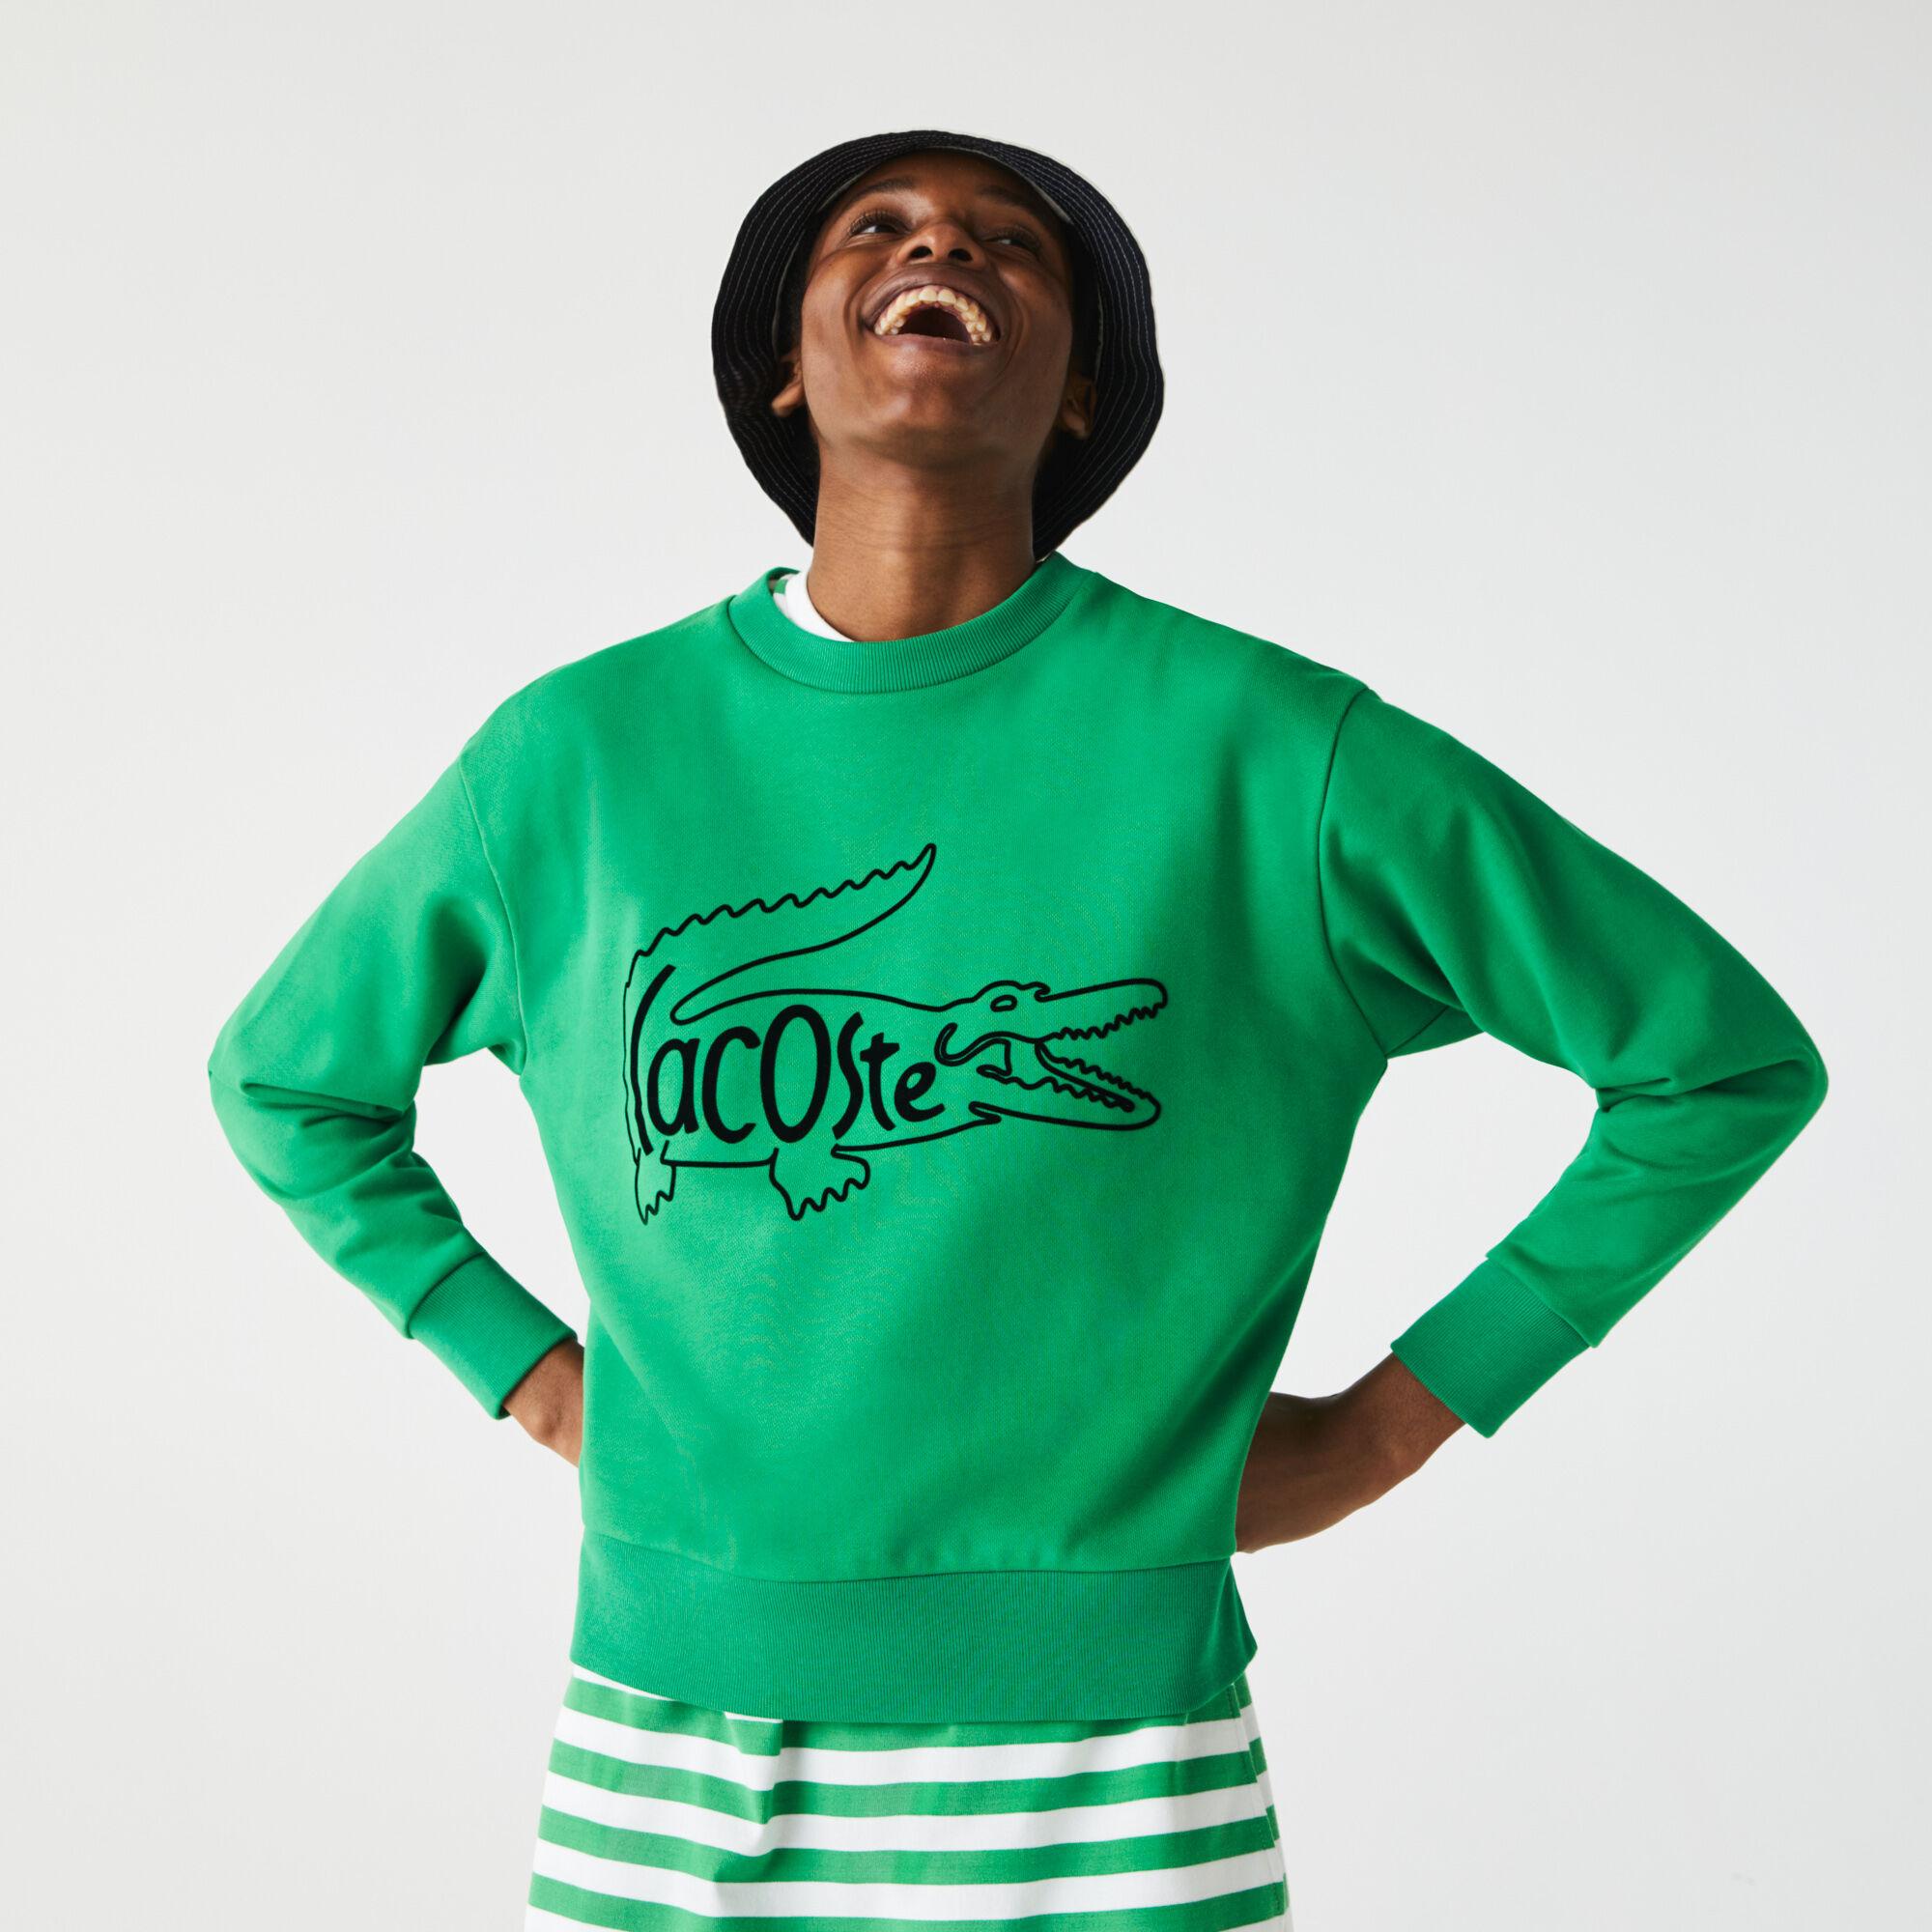 Women's Crew Neck Crocodile Print Cotton Fleece Sweatshirt